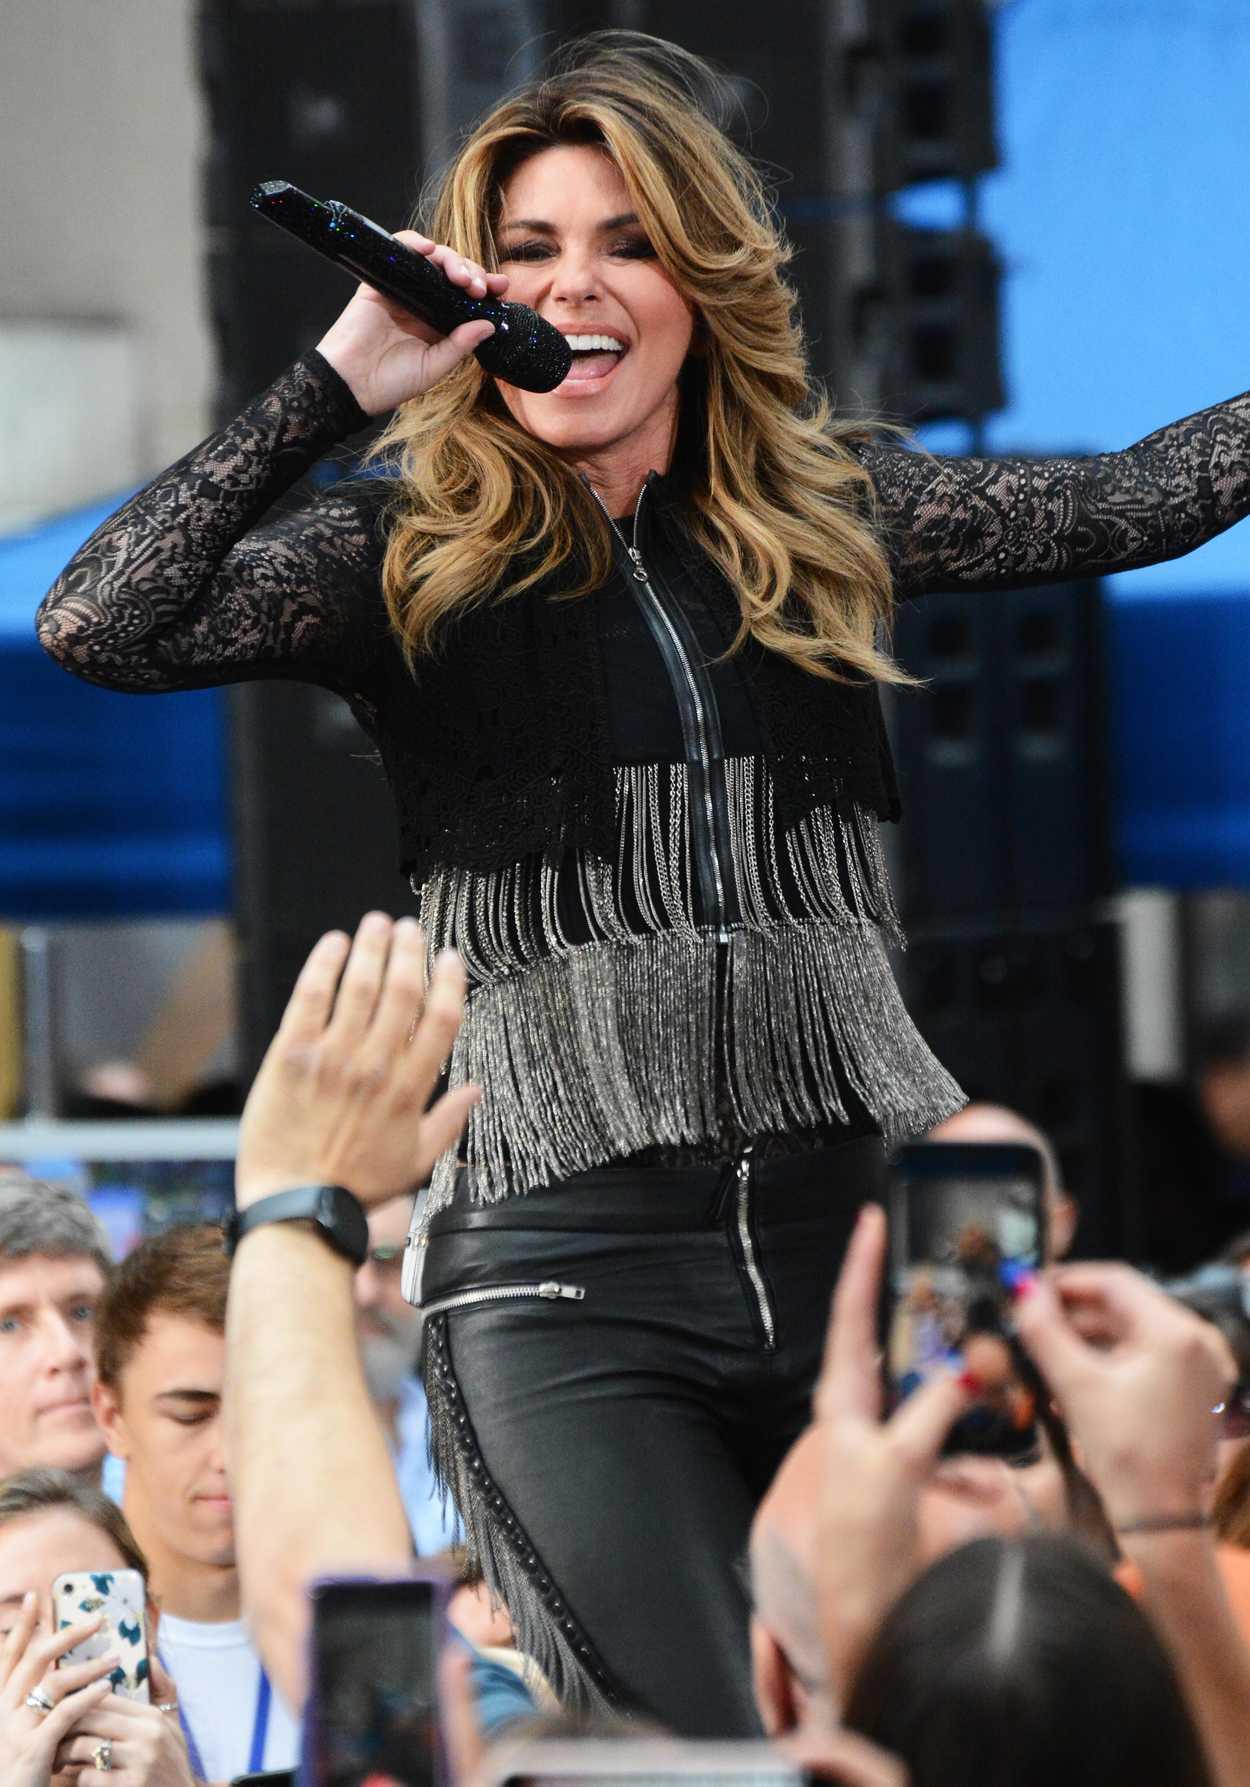 Shania Twain Full Tour Schedule & , Tour Dates & Concerts – Songkick